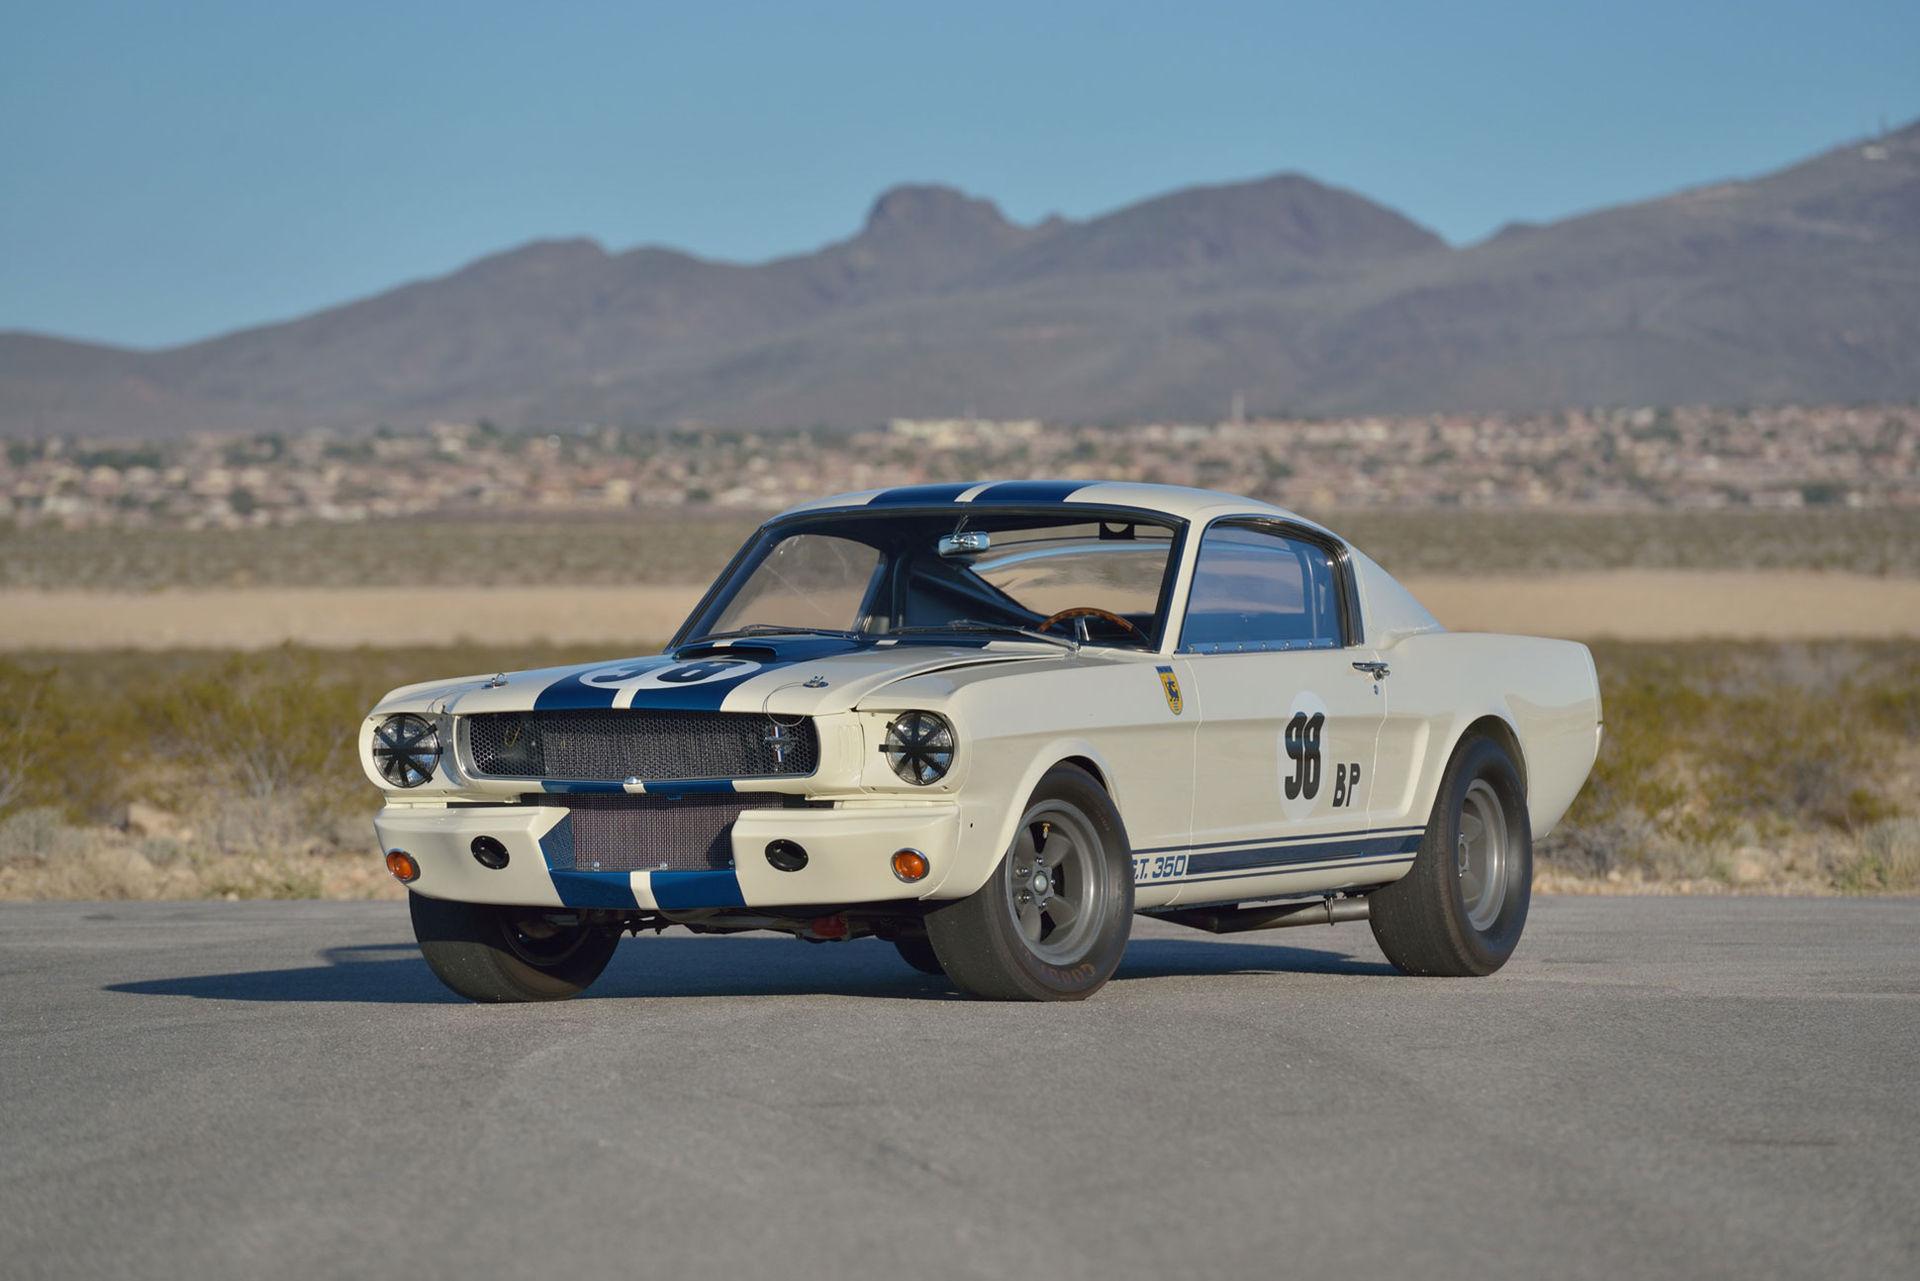 Ken Miles Flying Mustang snart på auktion